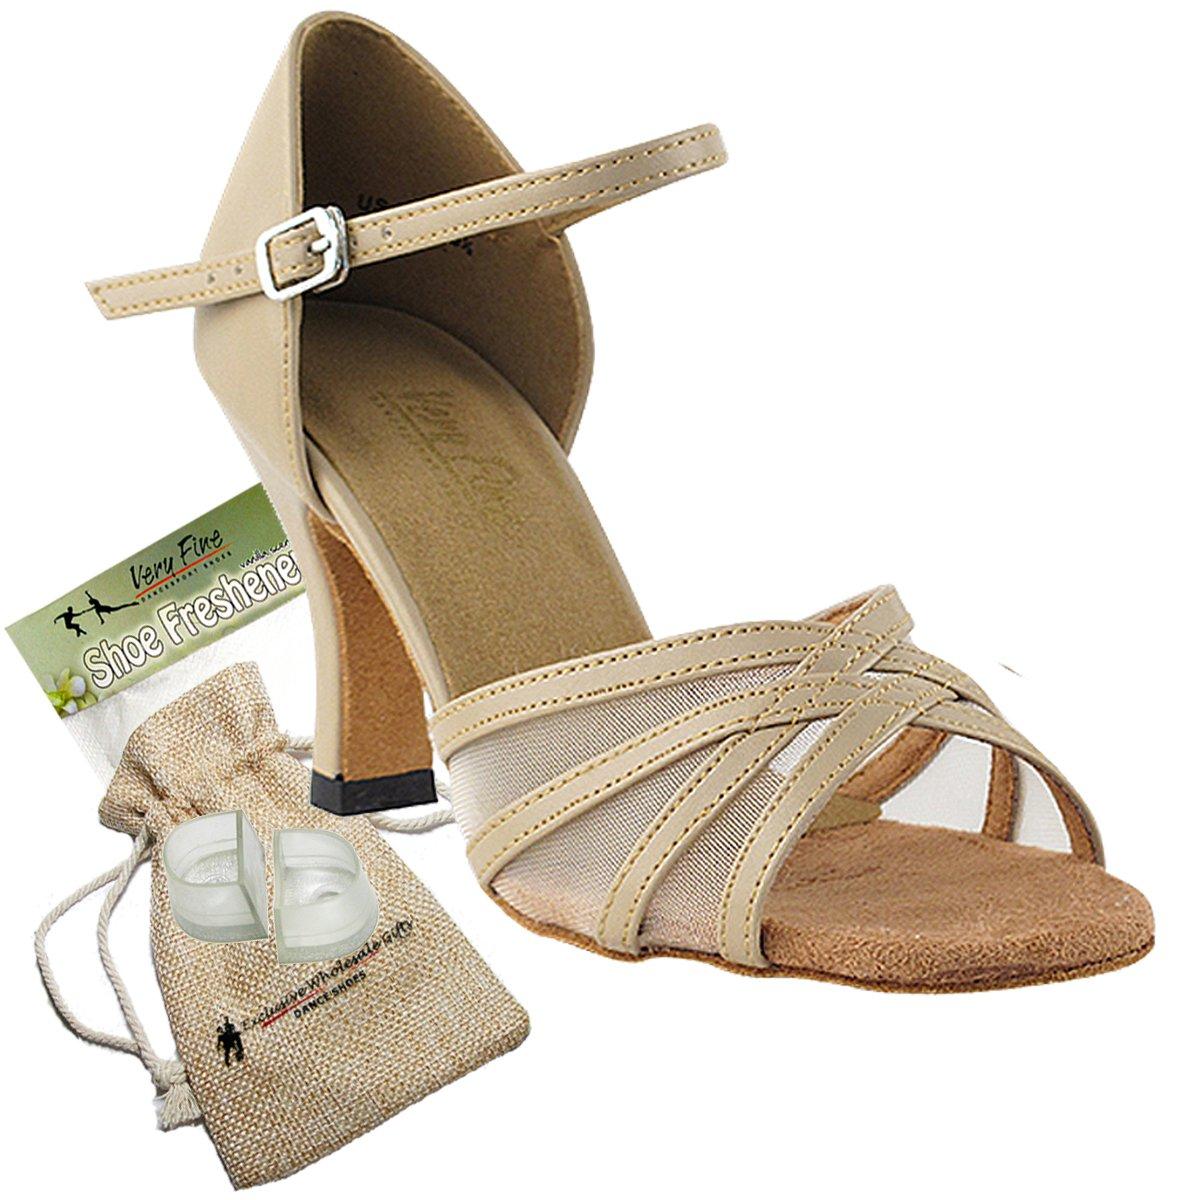 Women's Ballroom Dance Shoes Tango Wedding Salsa Dance Shoes Tan Leather & Flesh Mesh 6027EB Comfortable - Very Fine 2.5'' Heel 7.5 M US [Bundle 5]